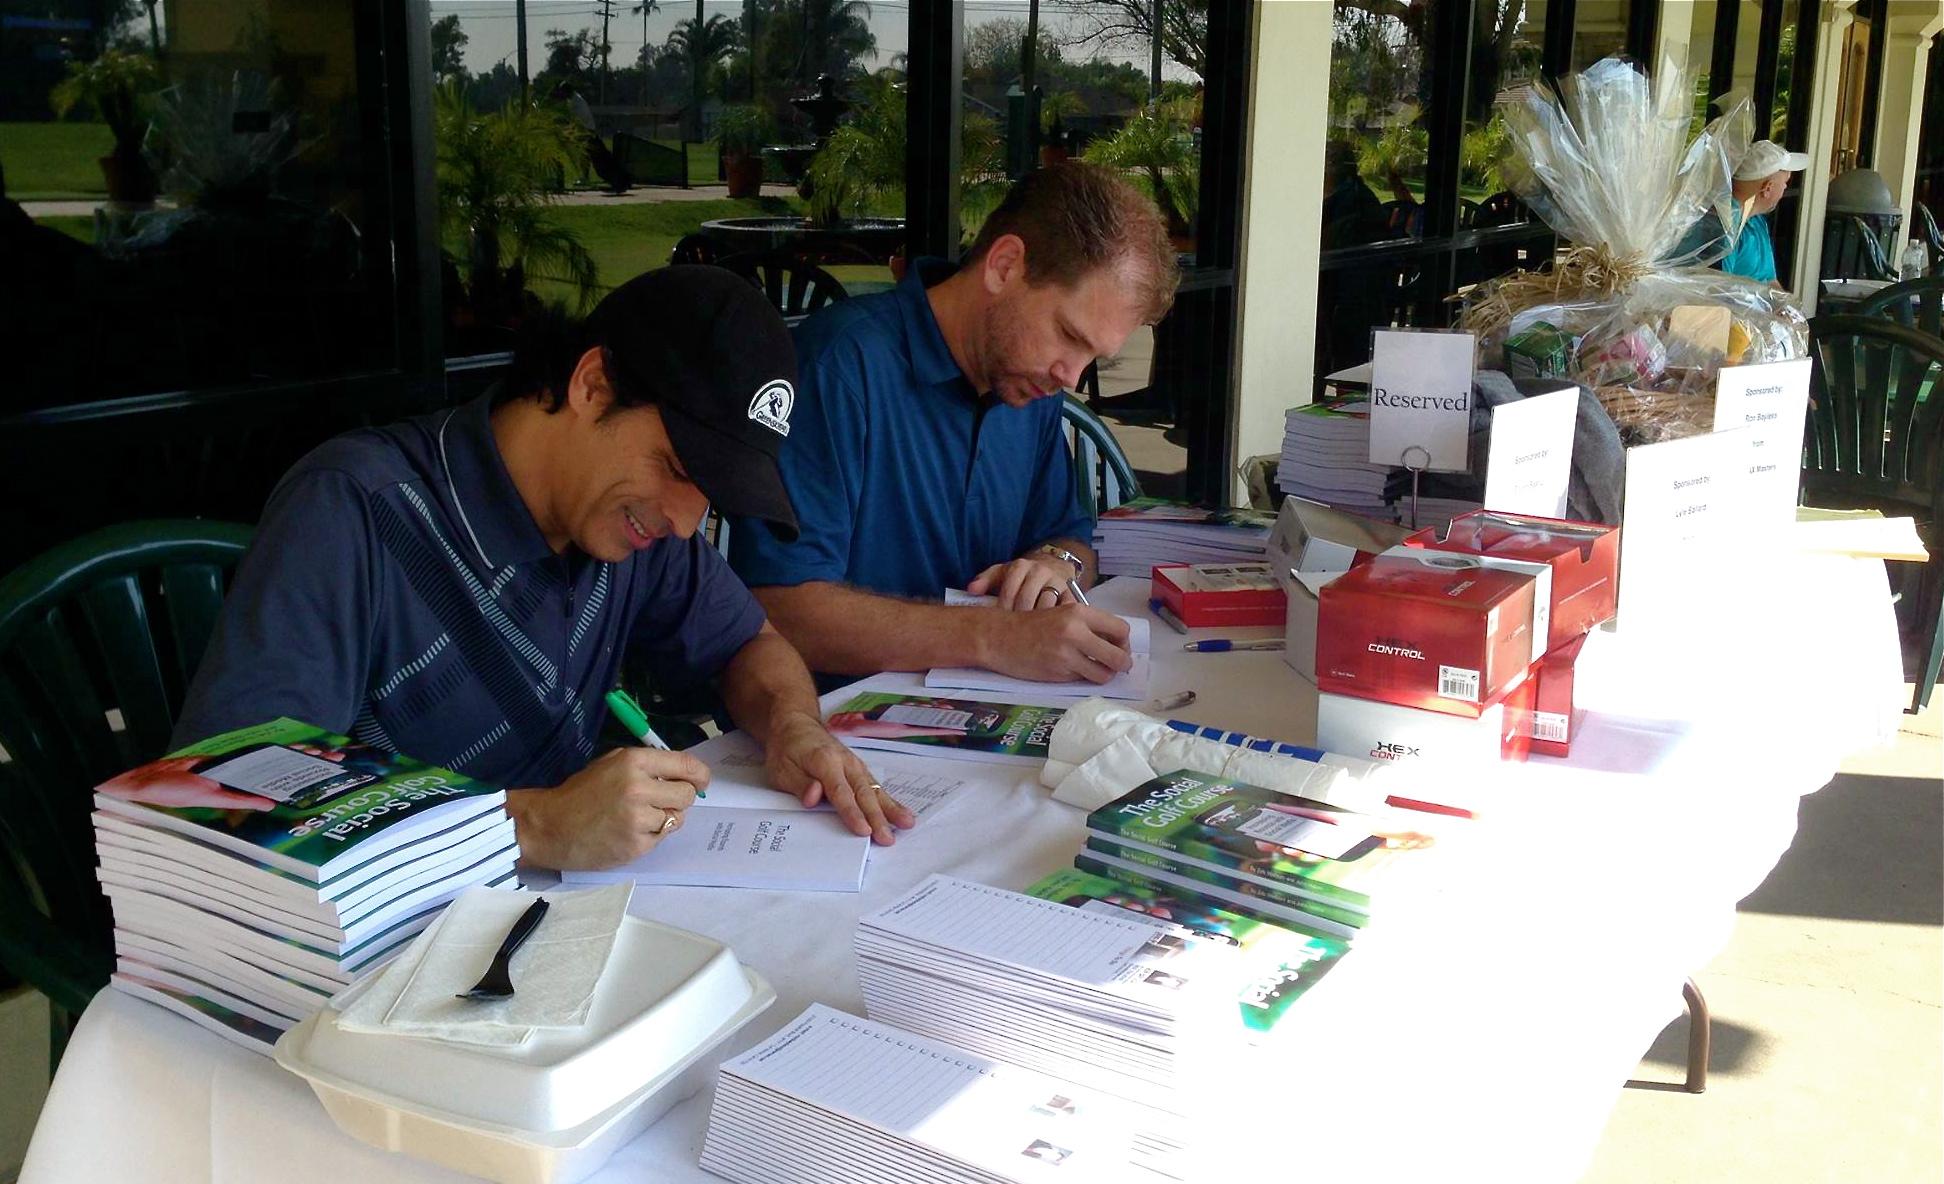 Zeb and John sign The Social Golf Course book